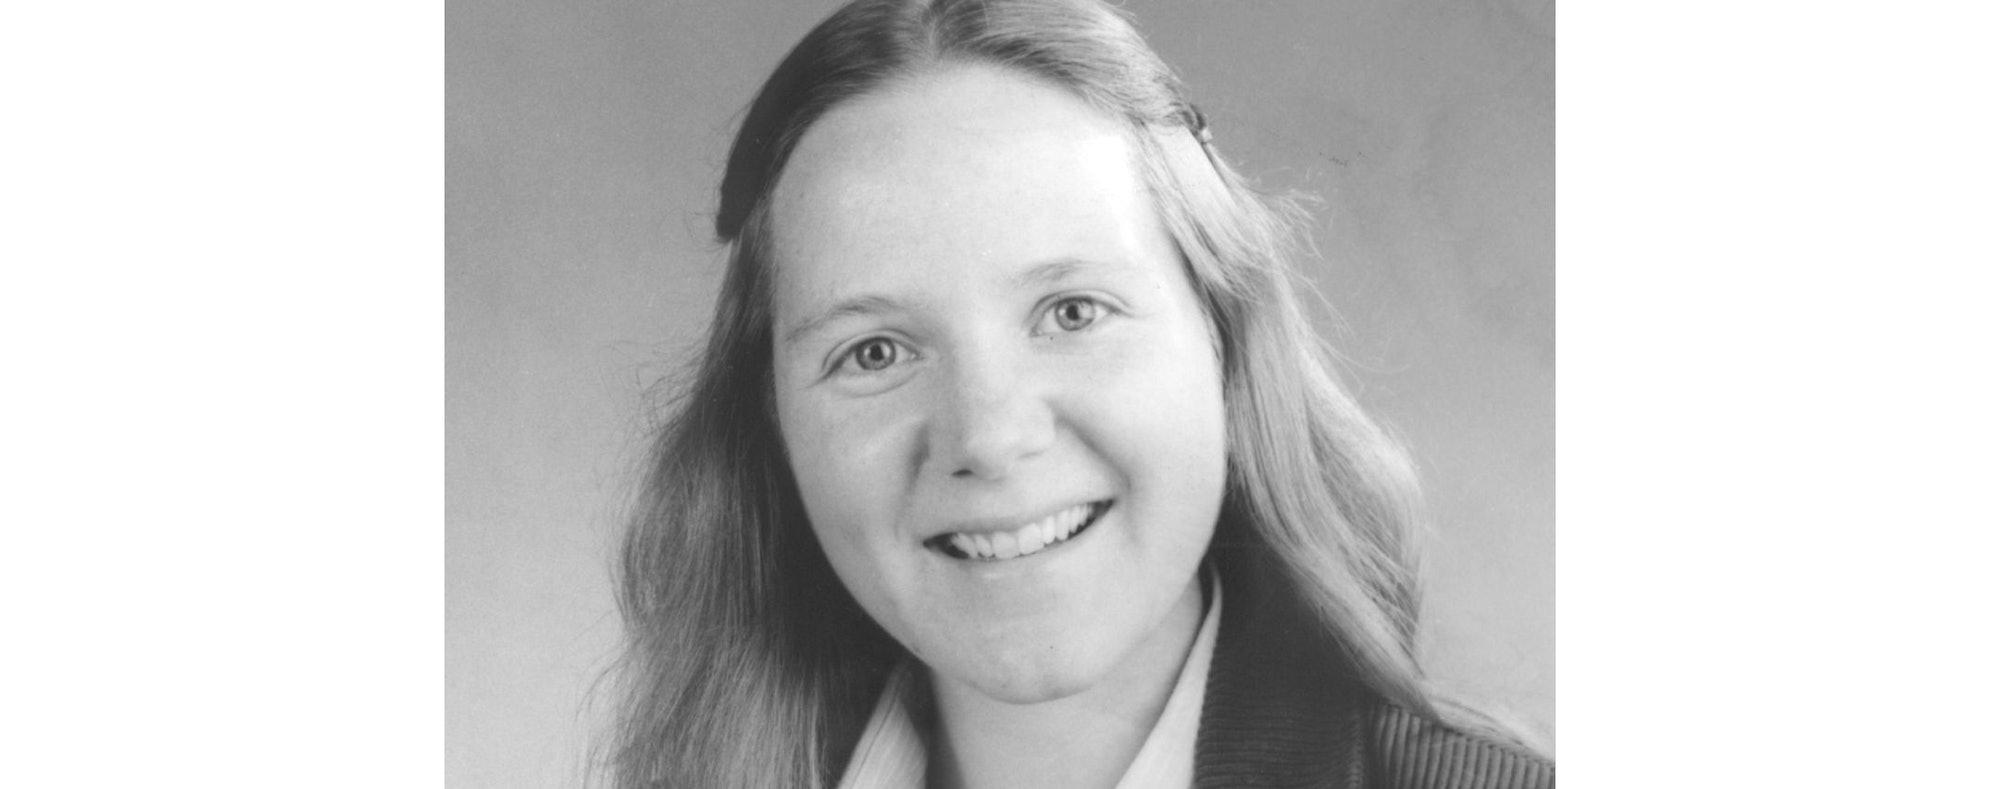 Journalist Lisha Gayle